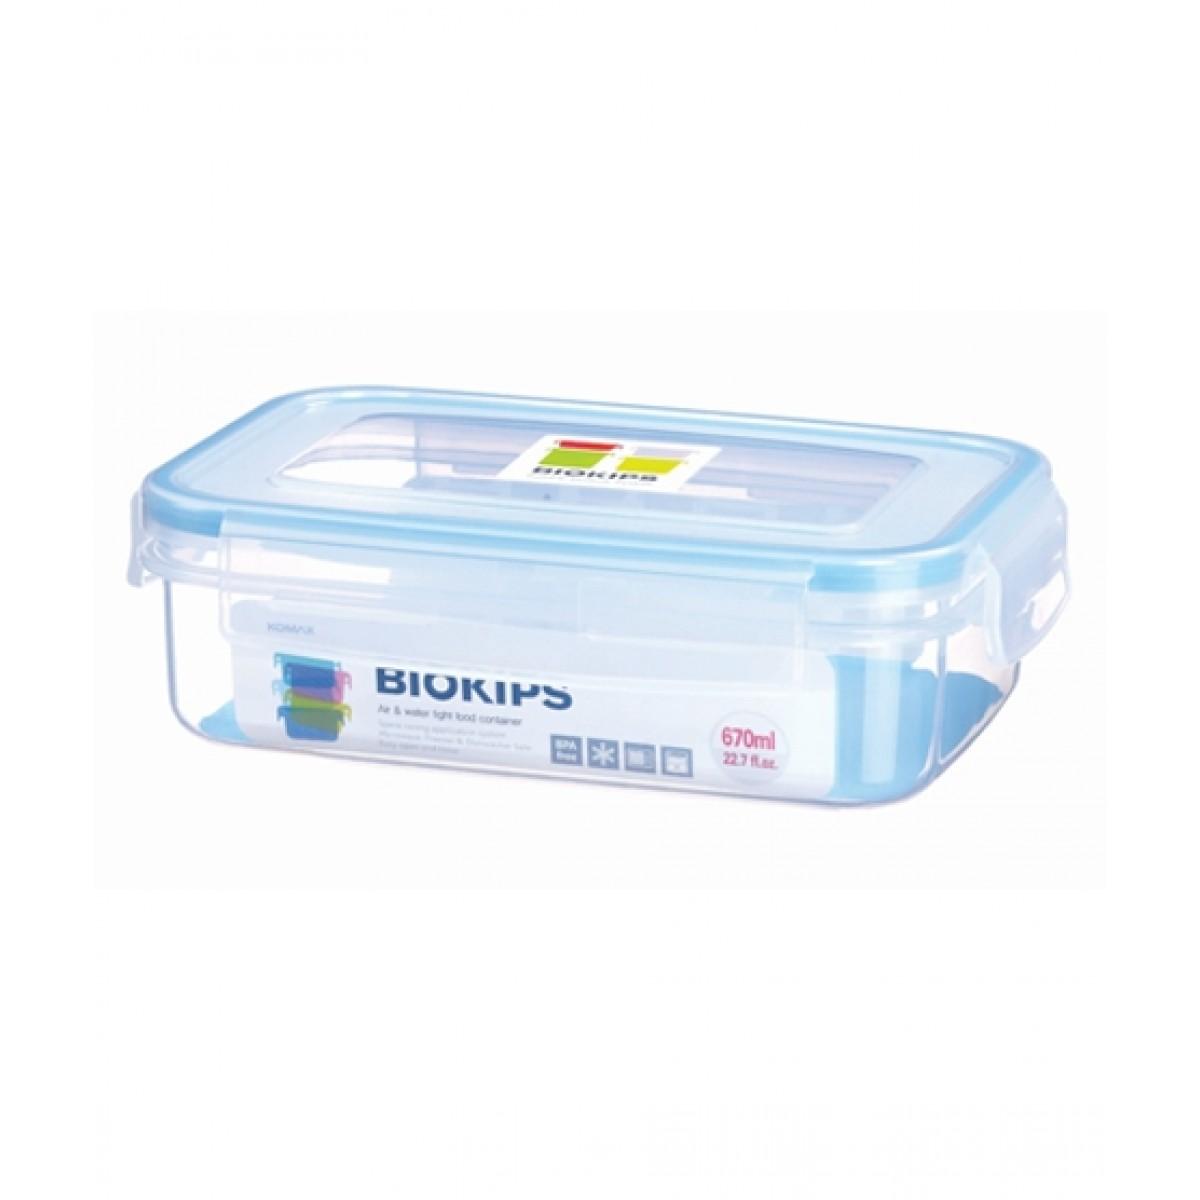 Komax Biokips R30 Air & Watertight Food Container 670ml (71543)